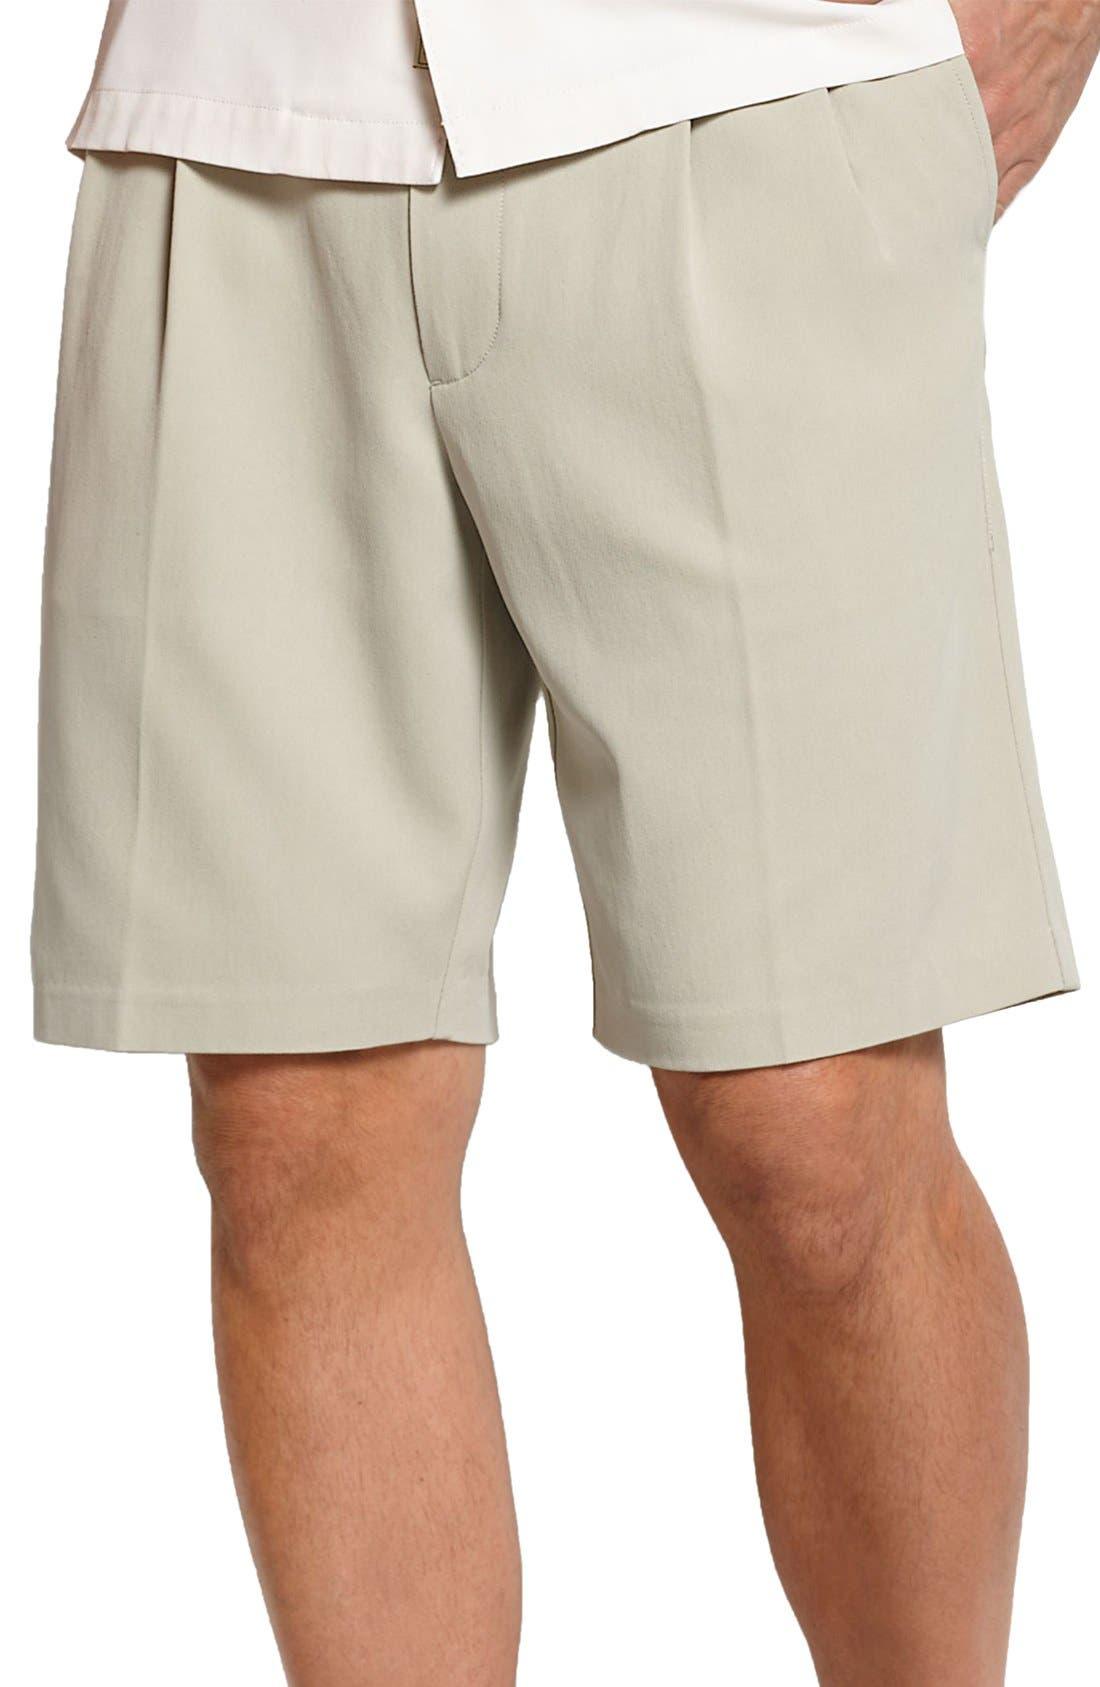 St. Thomas Pleated Shorts,                         Main,                         color, Abbey Stone